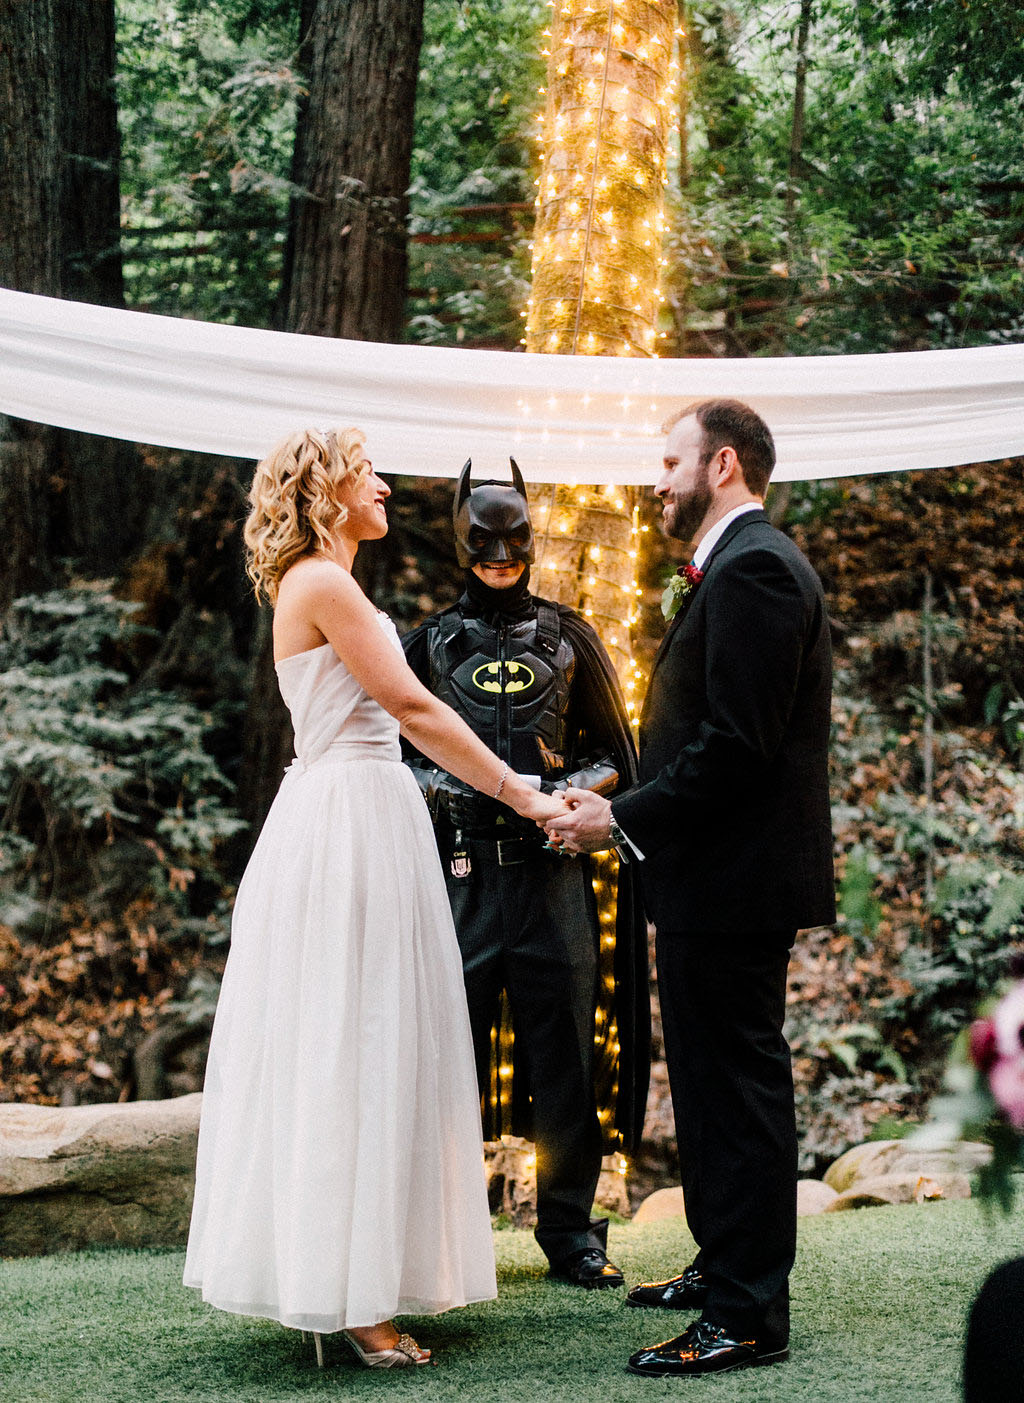 Casual Wedding Officiated By Batman 183 Rock N Roll Bride